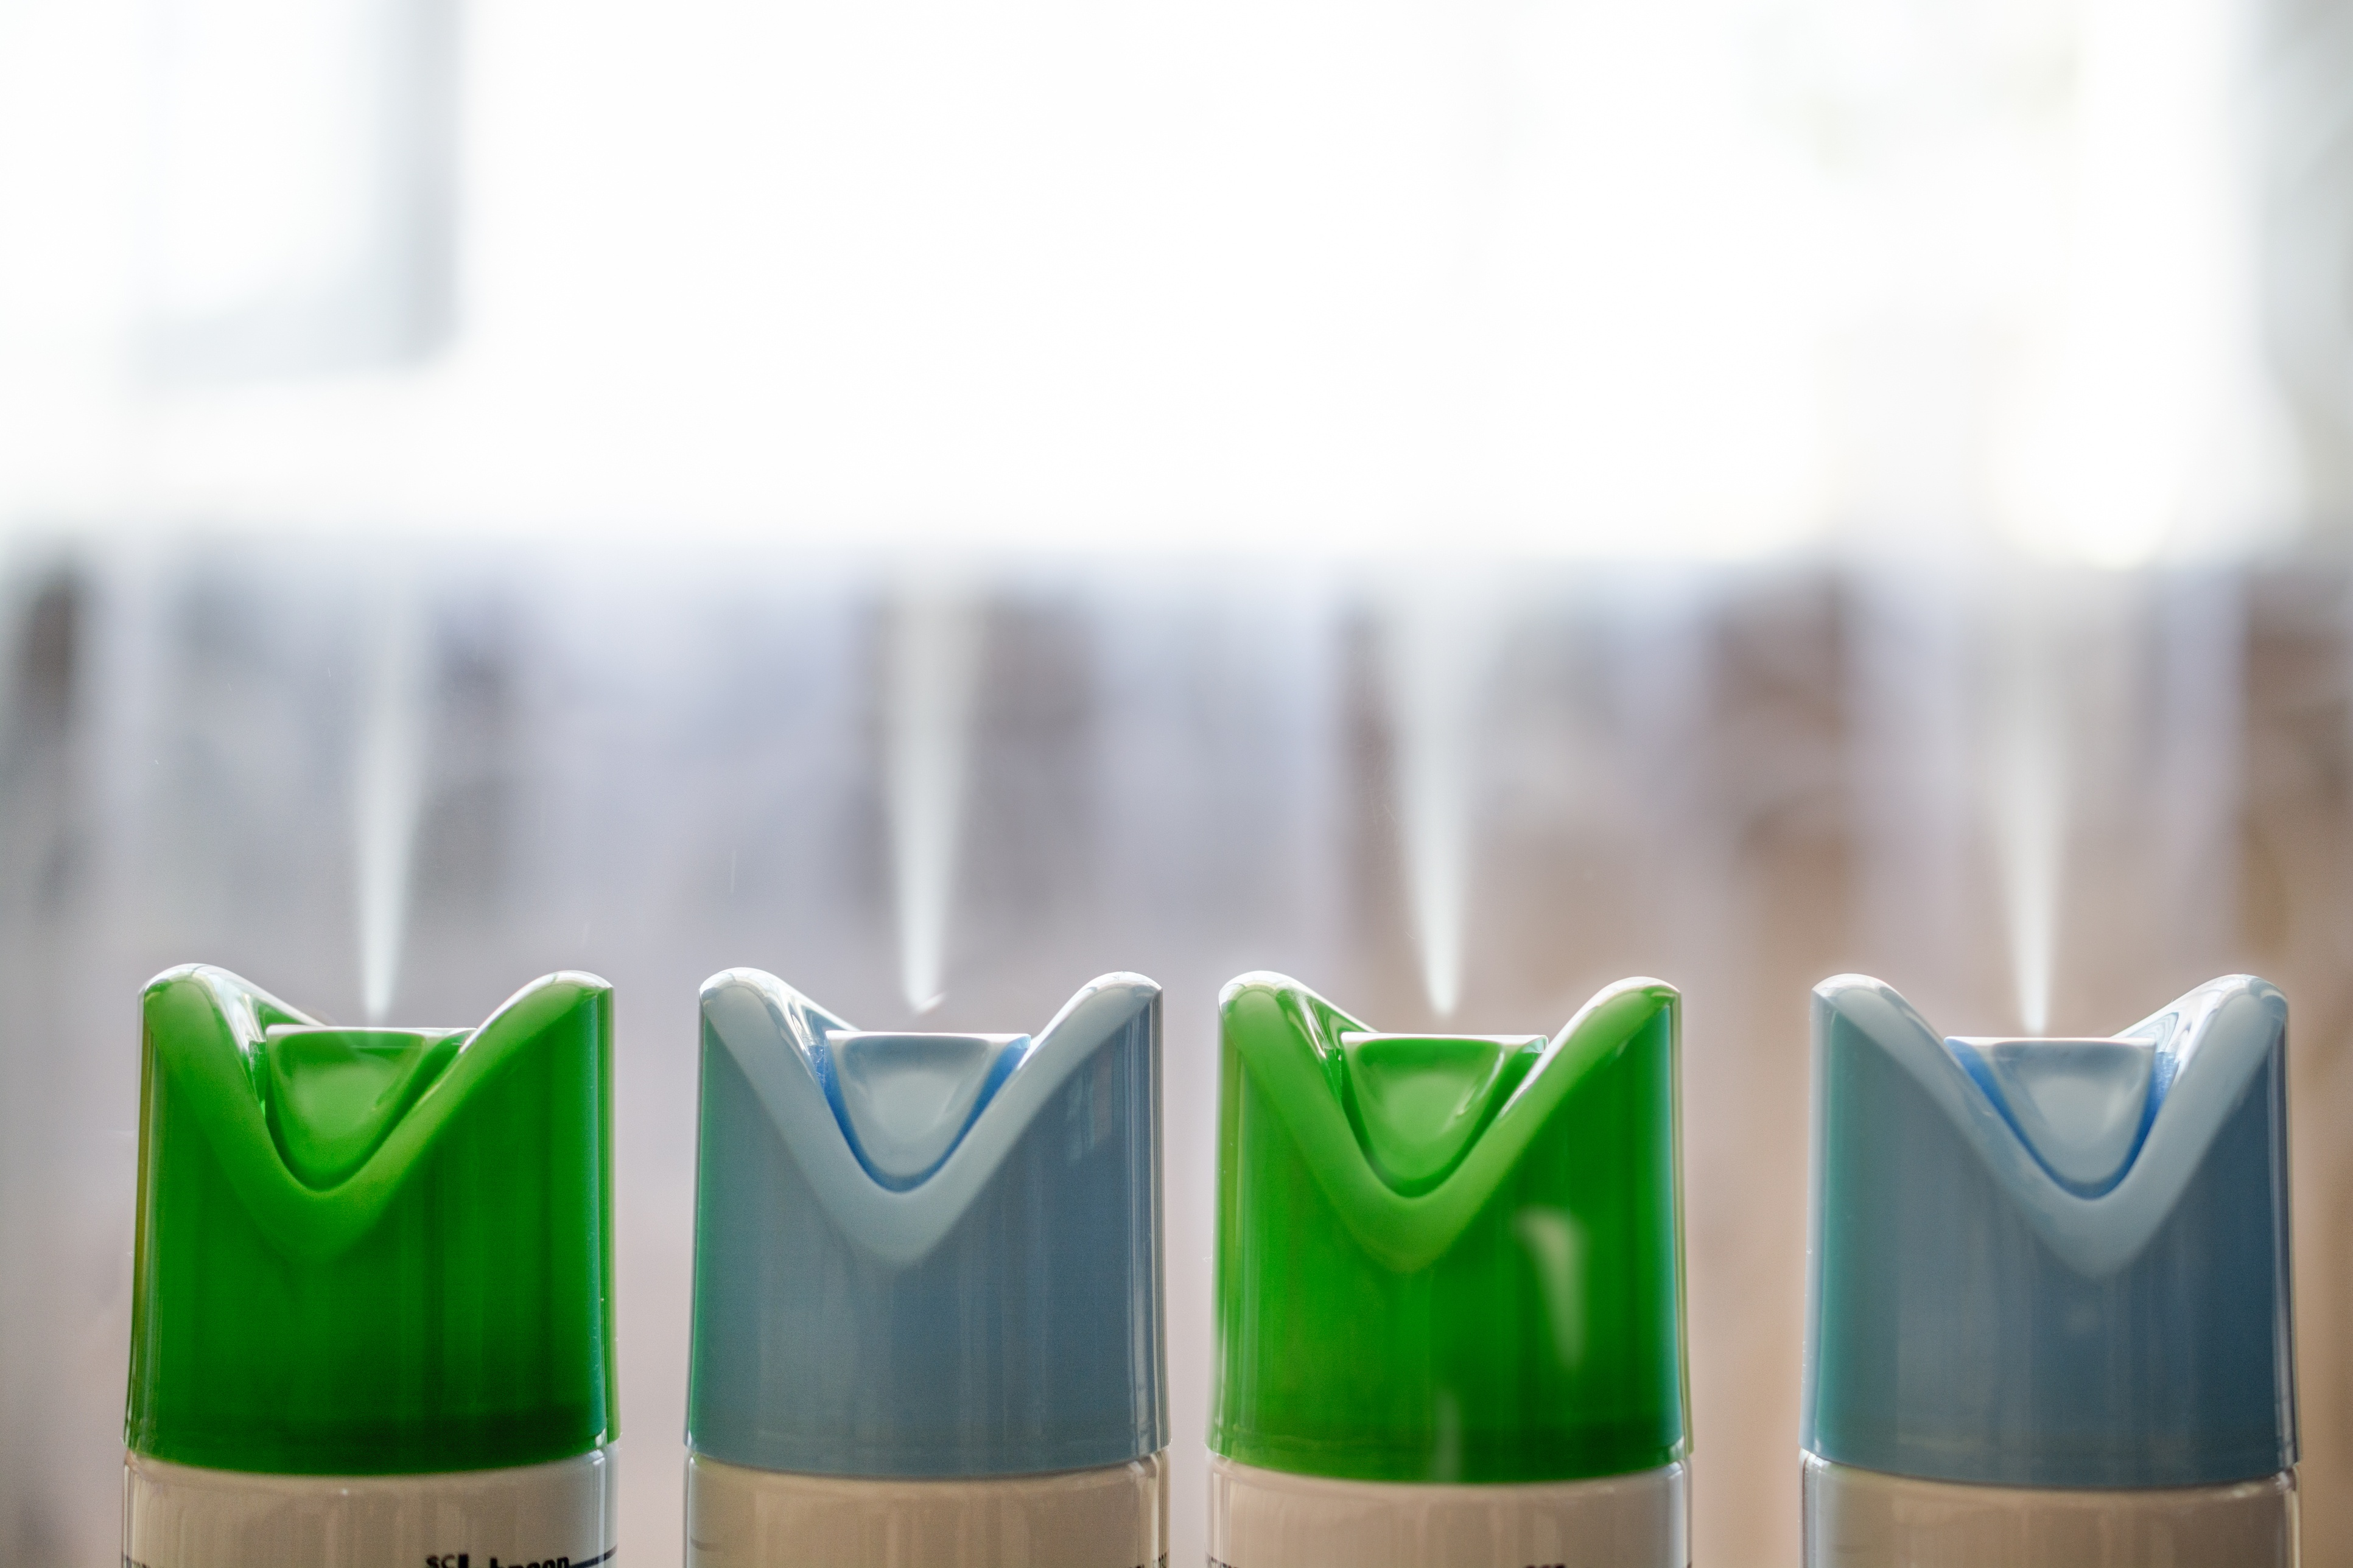 Room deodorizing and odor masking fragrances